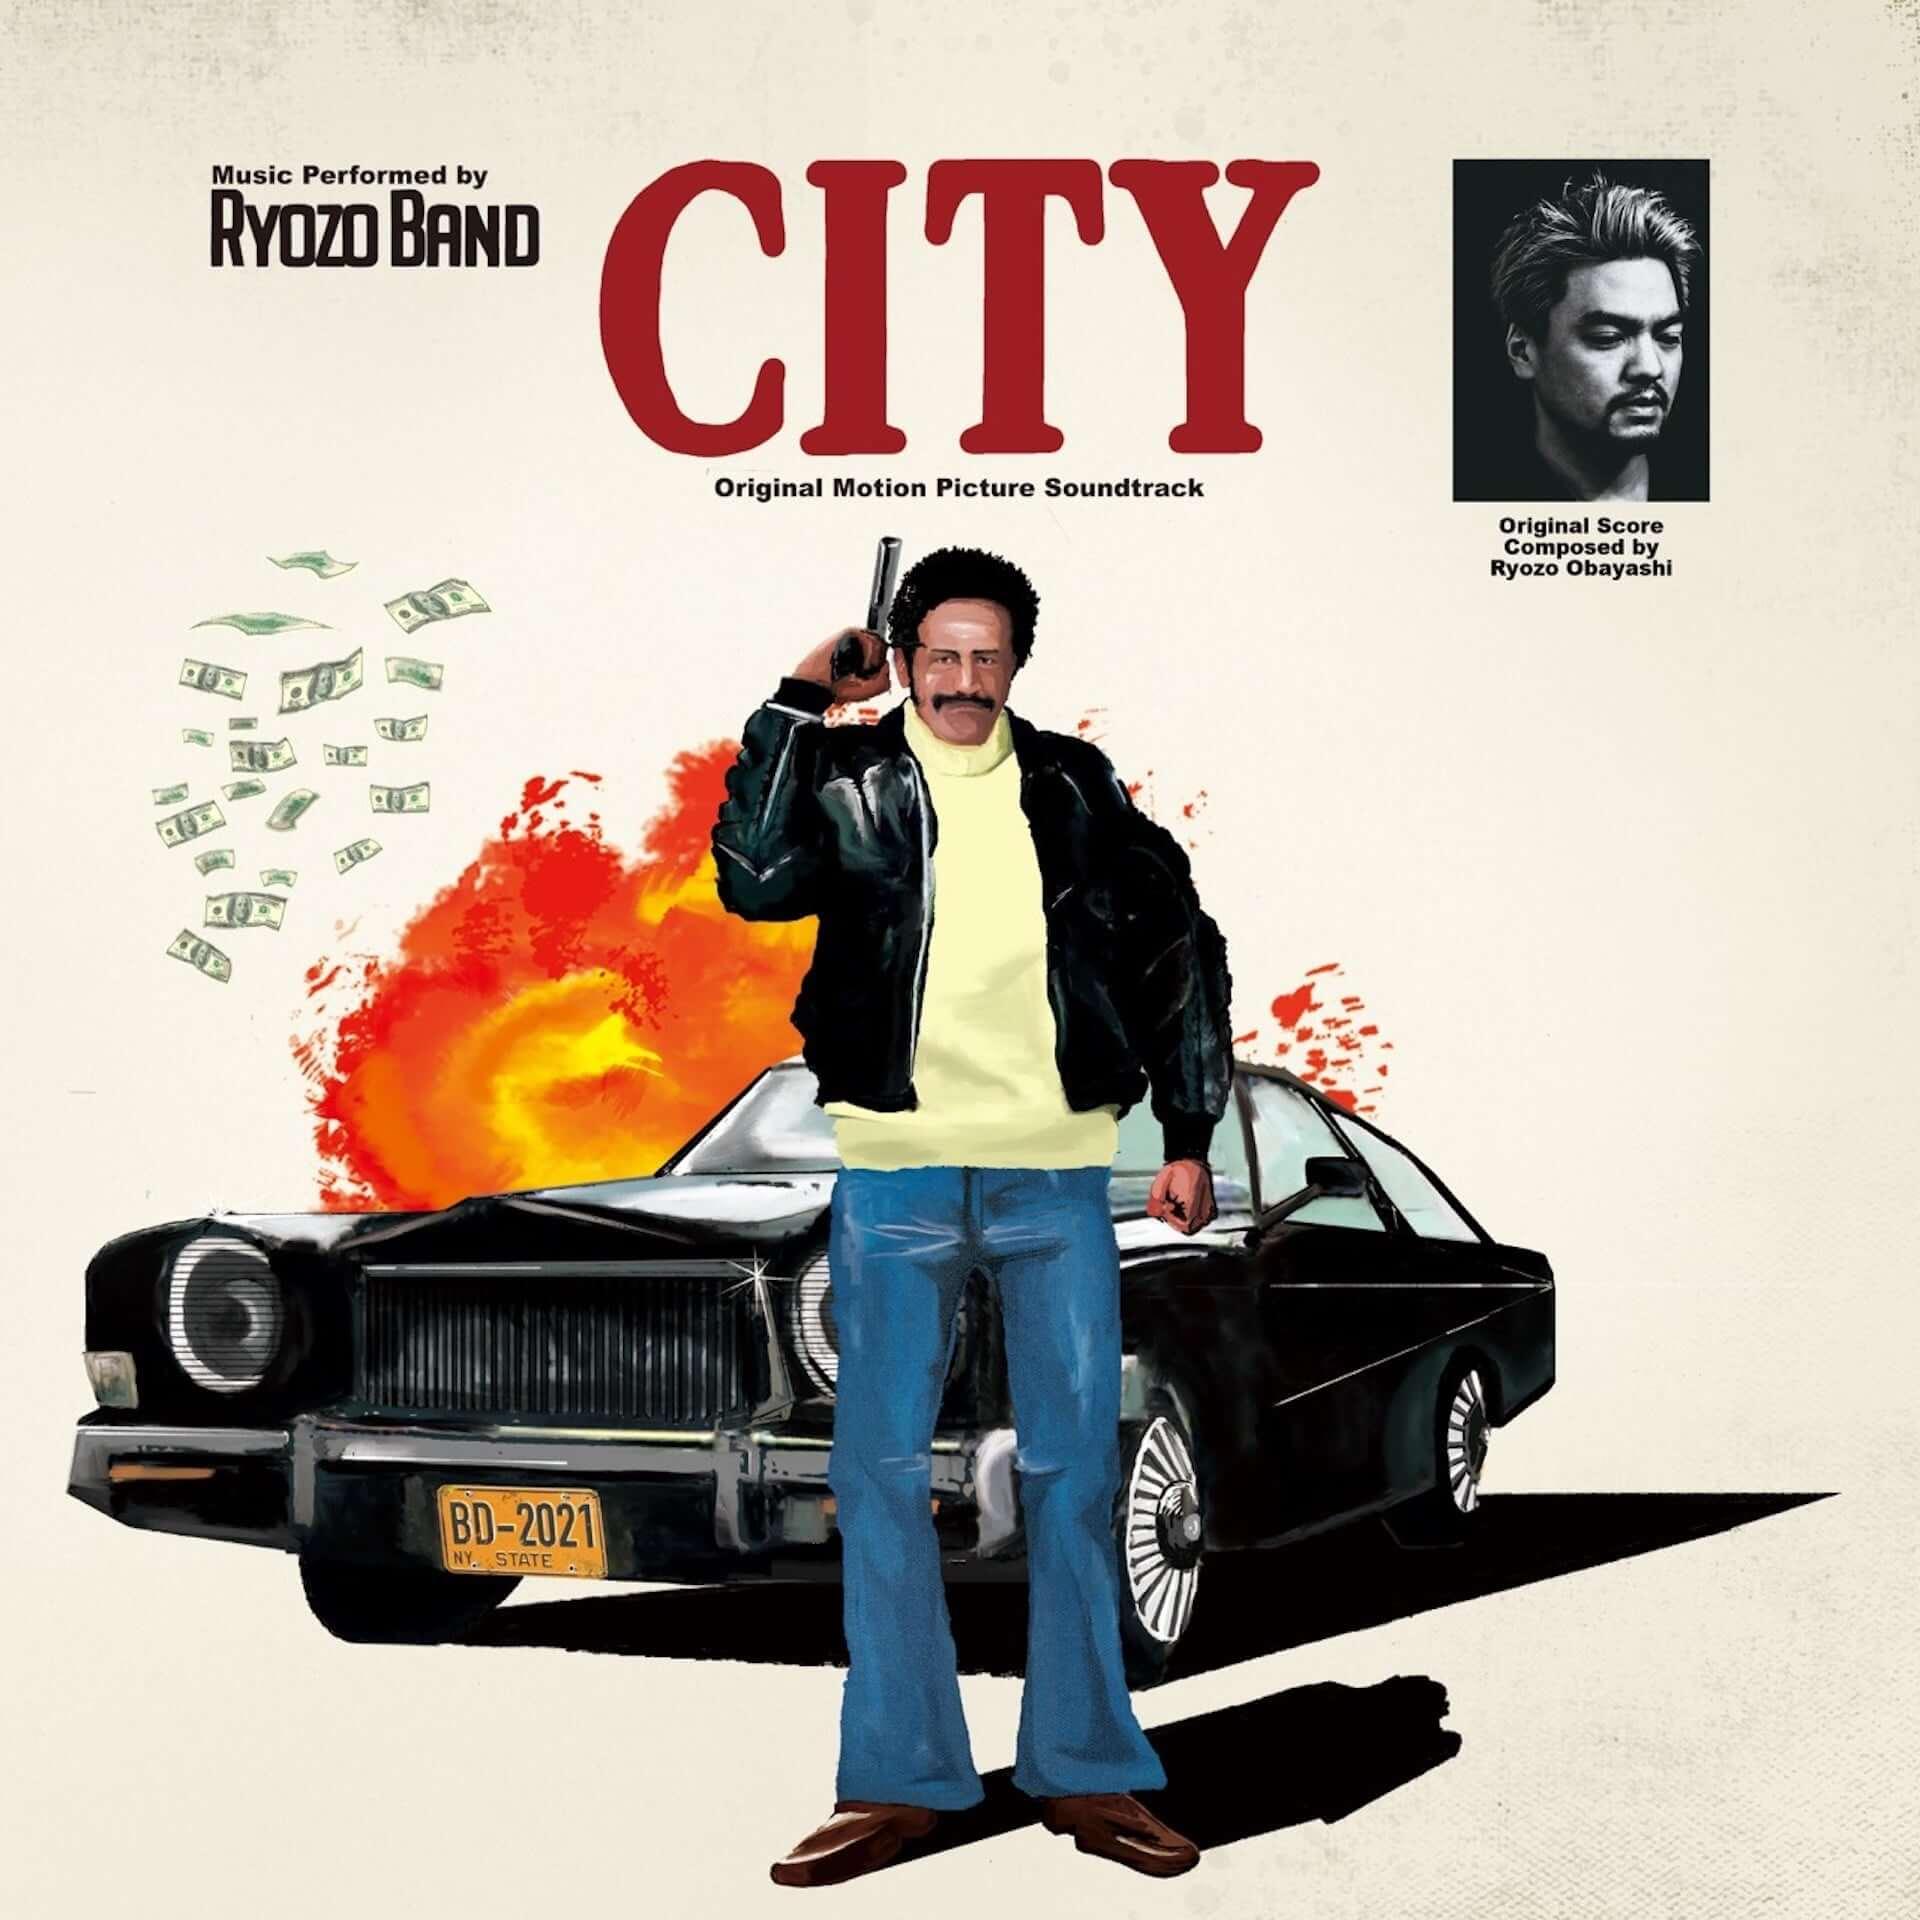 SANABAGUN.の大林亮三率いるRyozo Bandが2ndアルバム『CITY』をリリース決定!Radiallとのコラボ曲も収録 music210108_ryozo-band_1-1920x1920